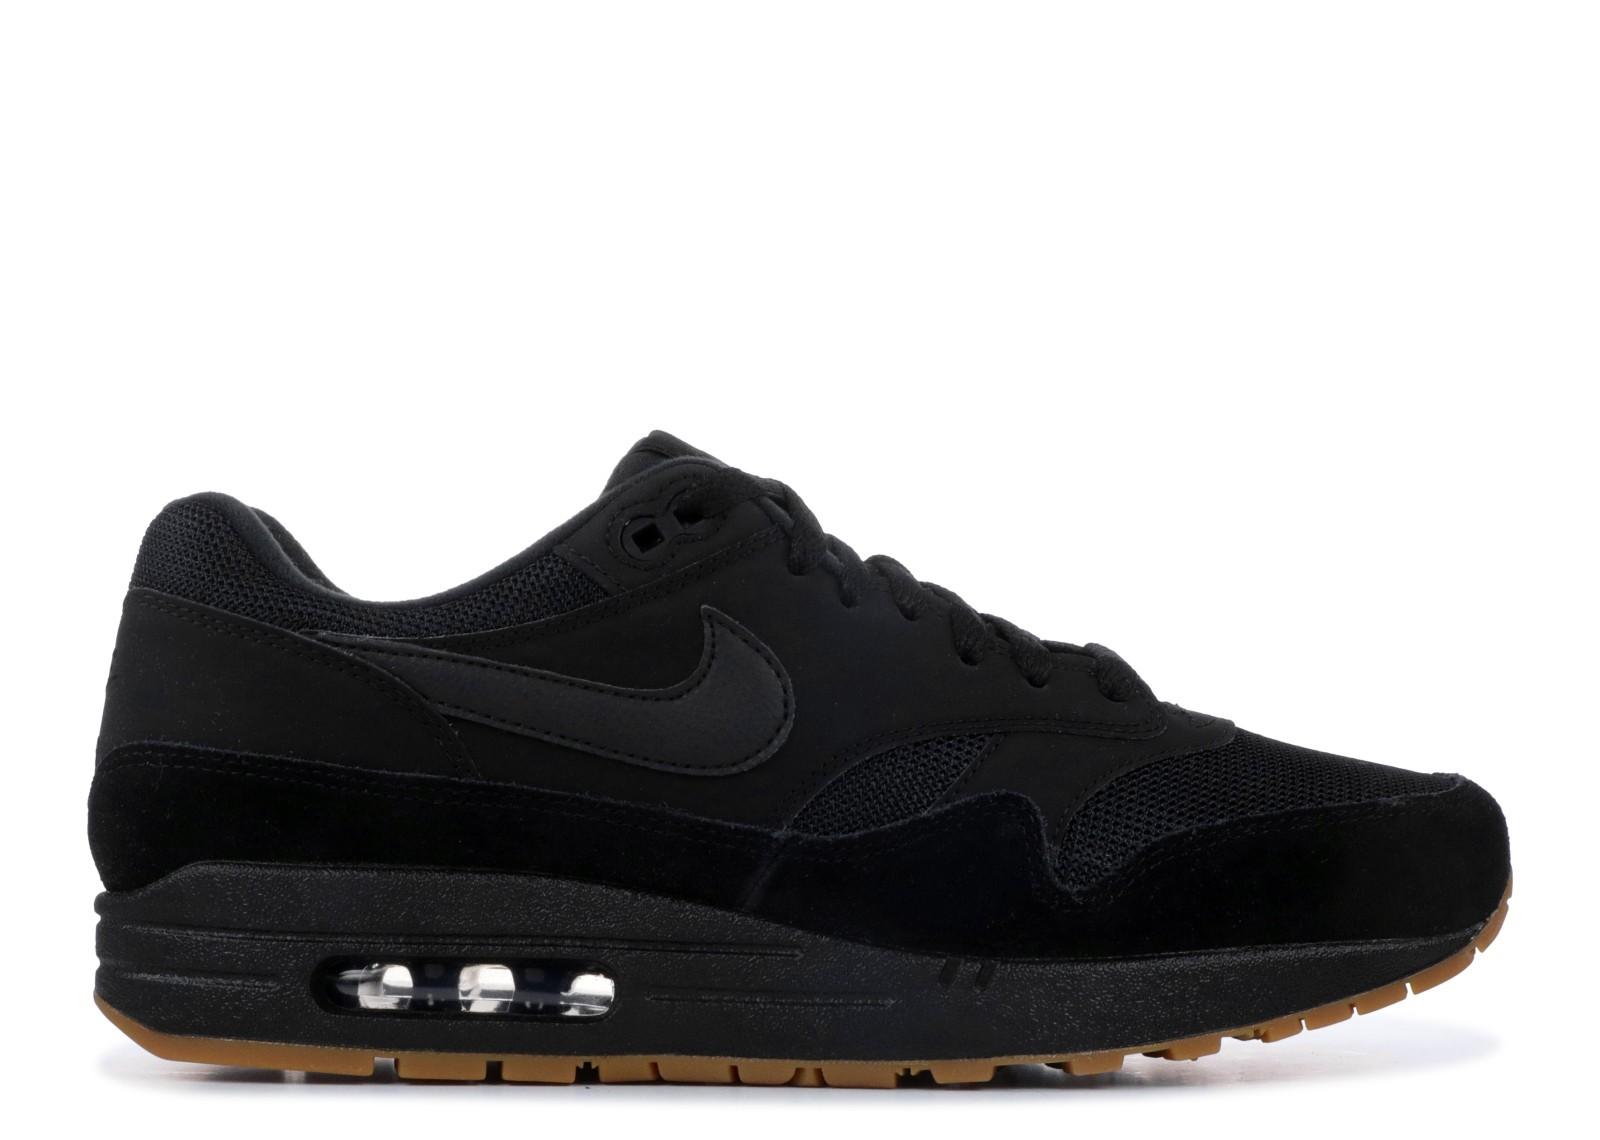 premium selection dc569 20391 Prev Nike Air Max 1 Triple Black Gum AH8145-007